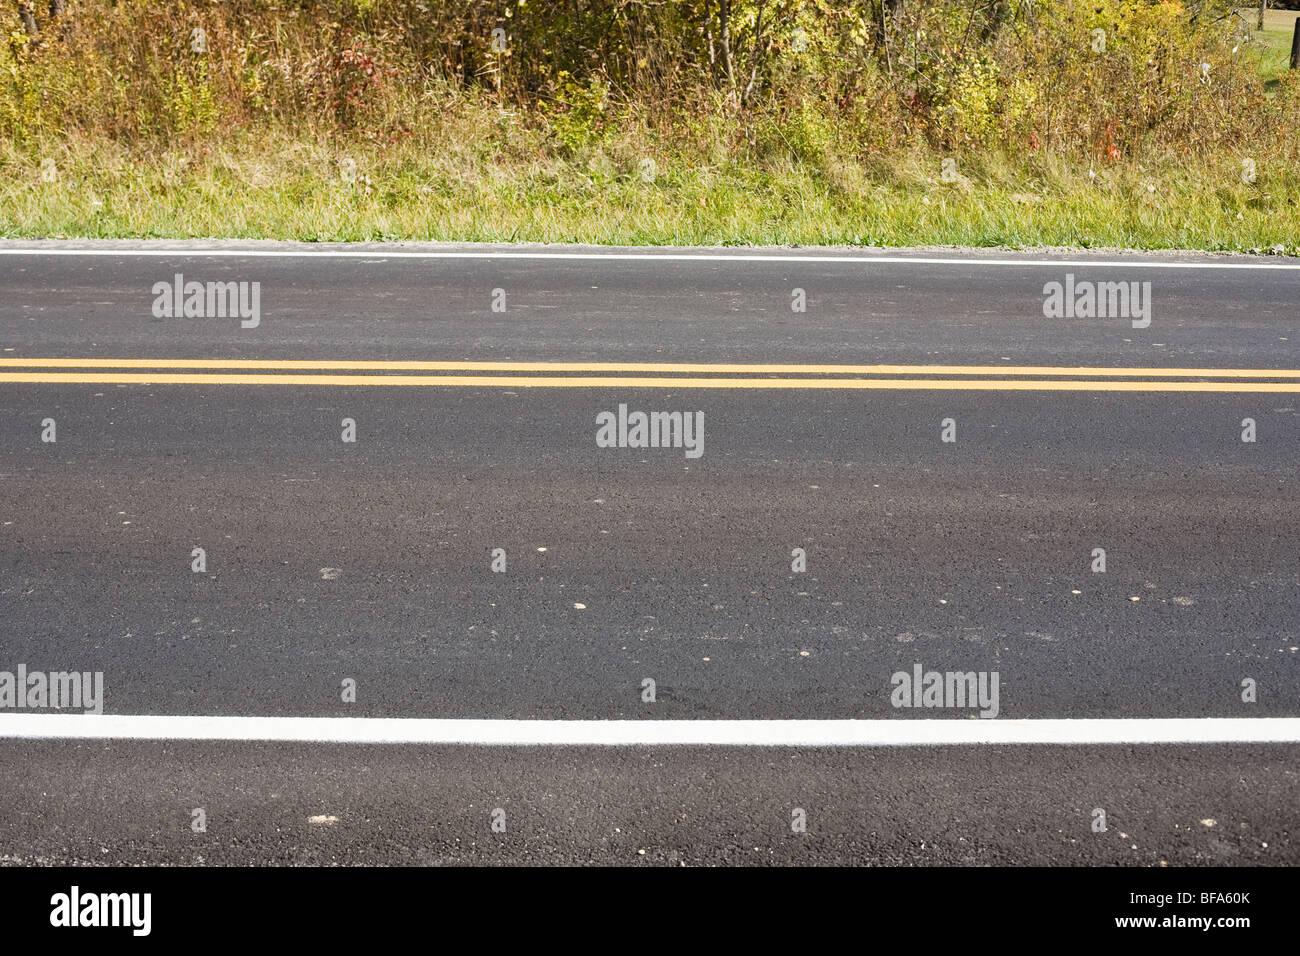 Eine zweispurige Straße Stockbild